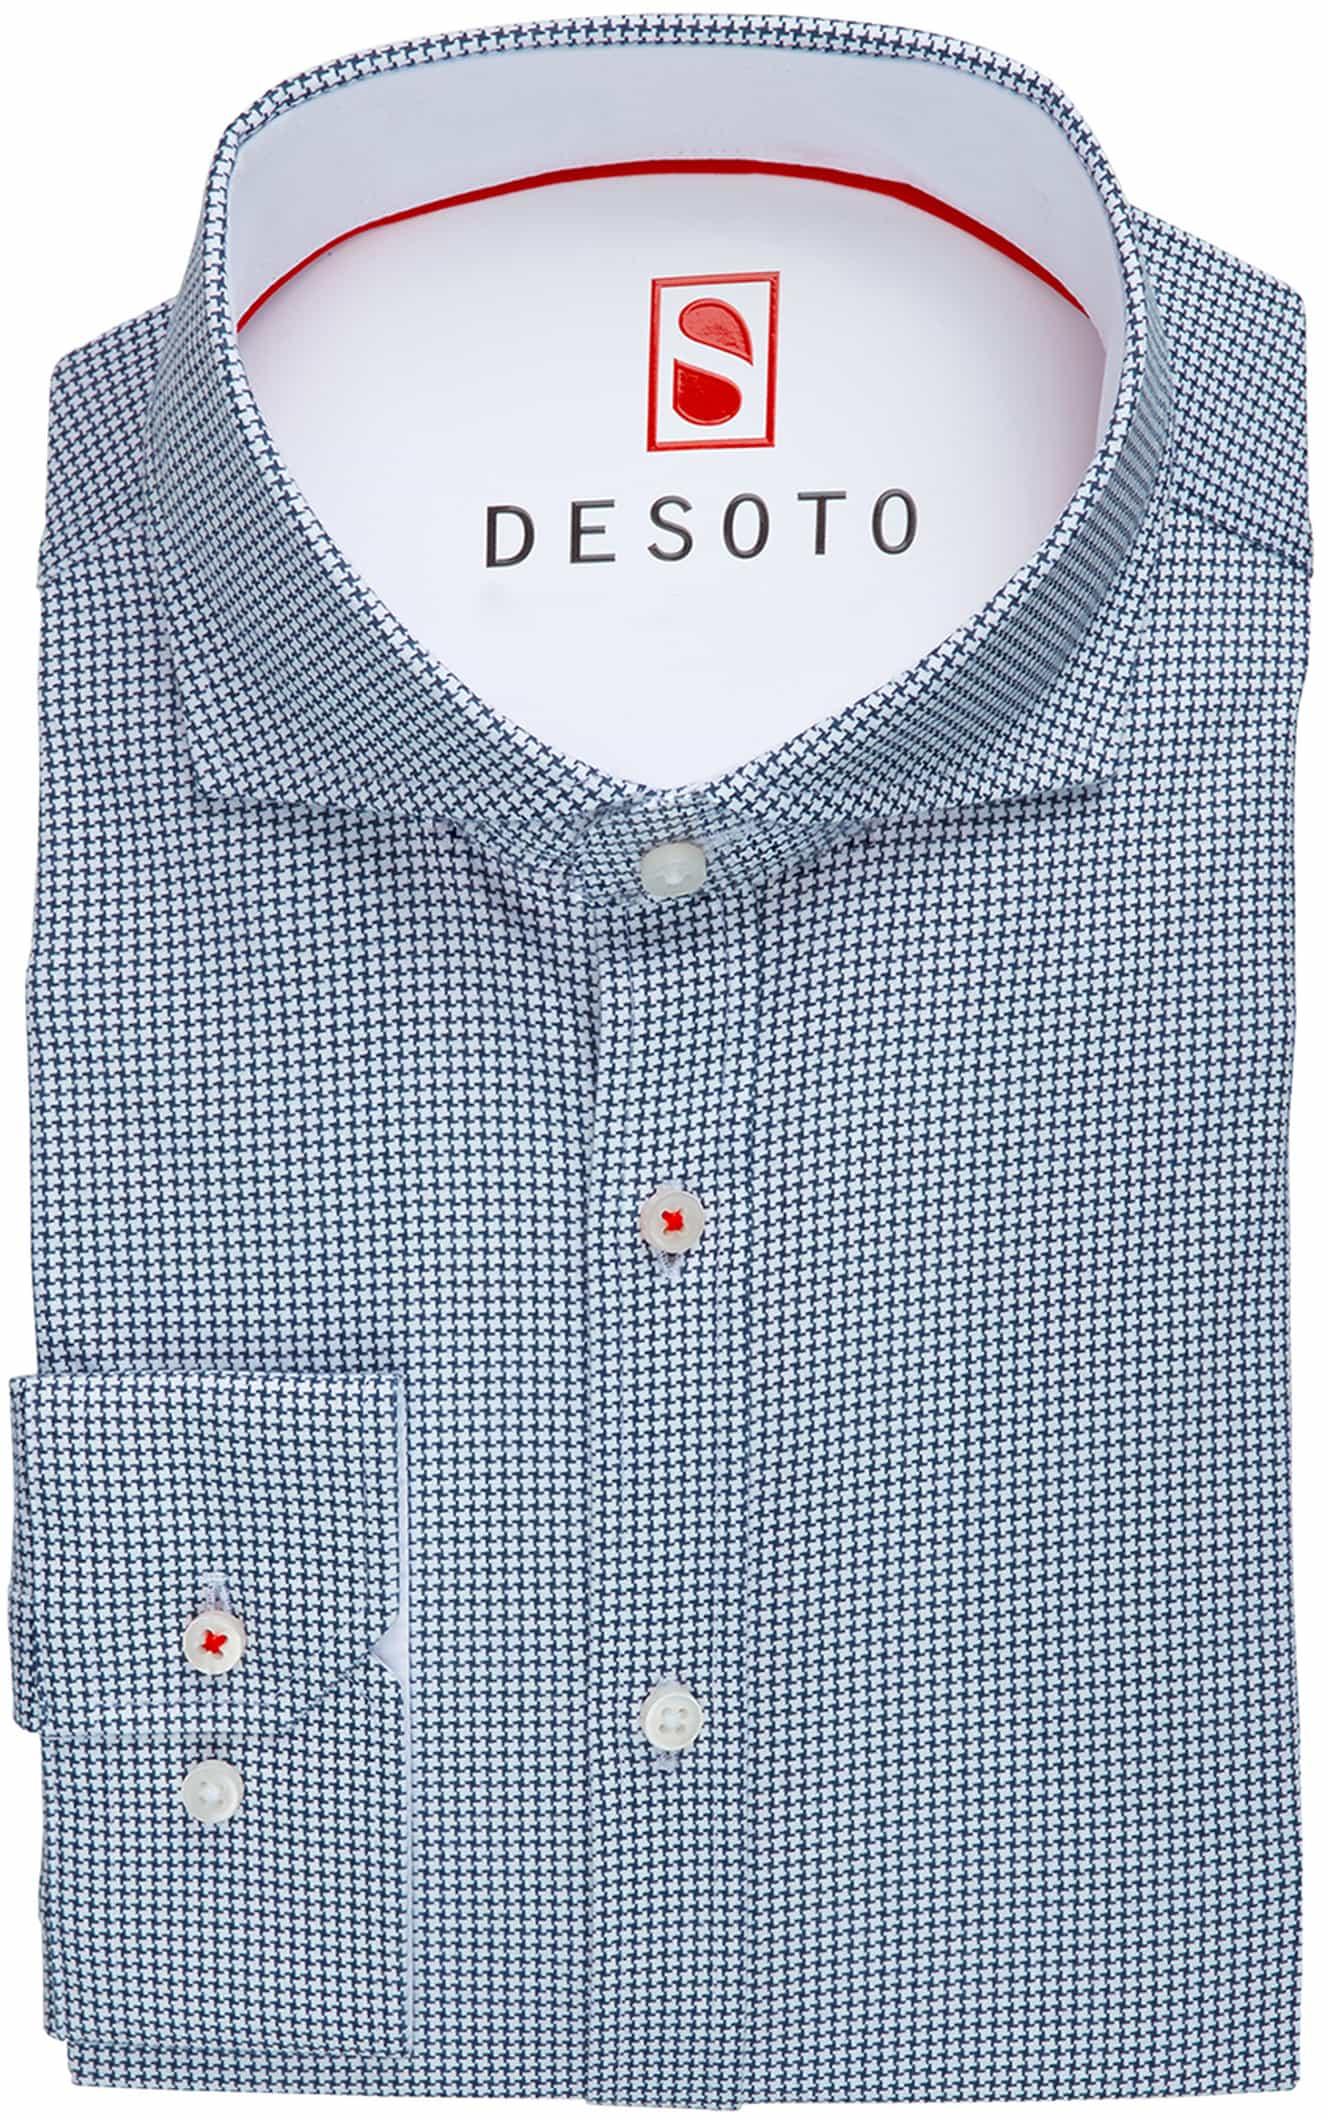 Desoto Overhemd Strijkvrij PDP foto 2